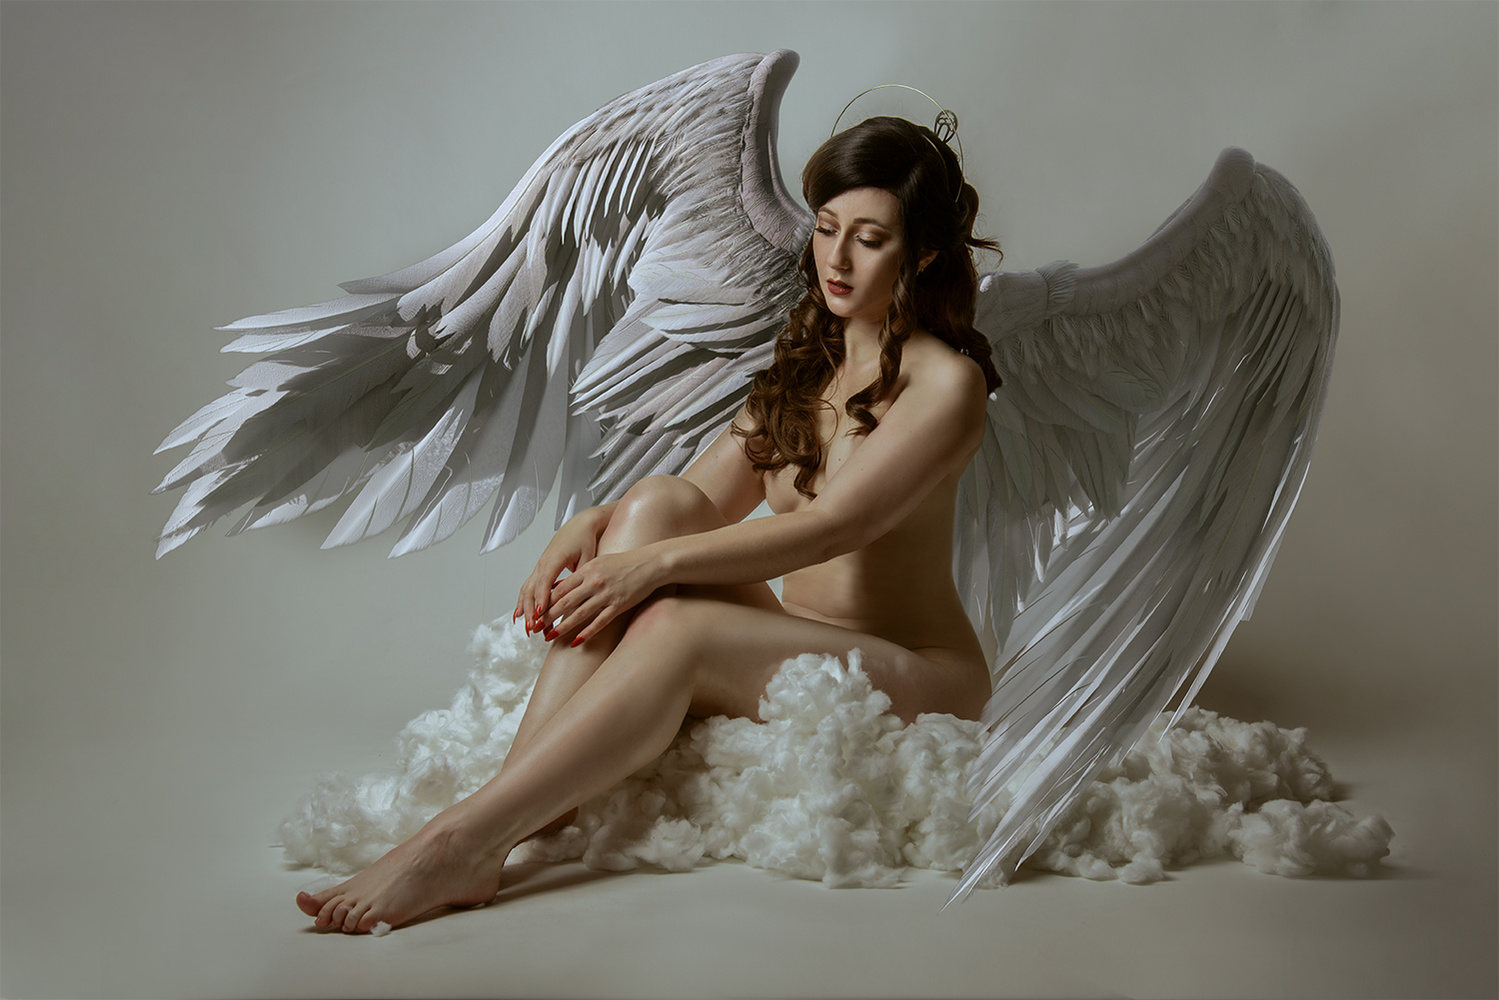 Wings by Sanne van Bergenhenegouwen